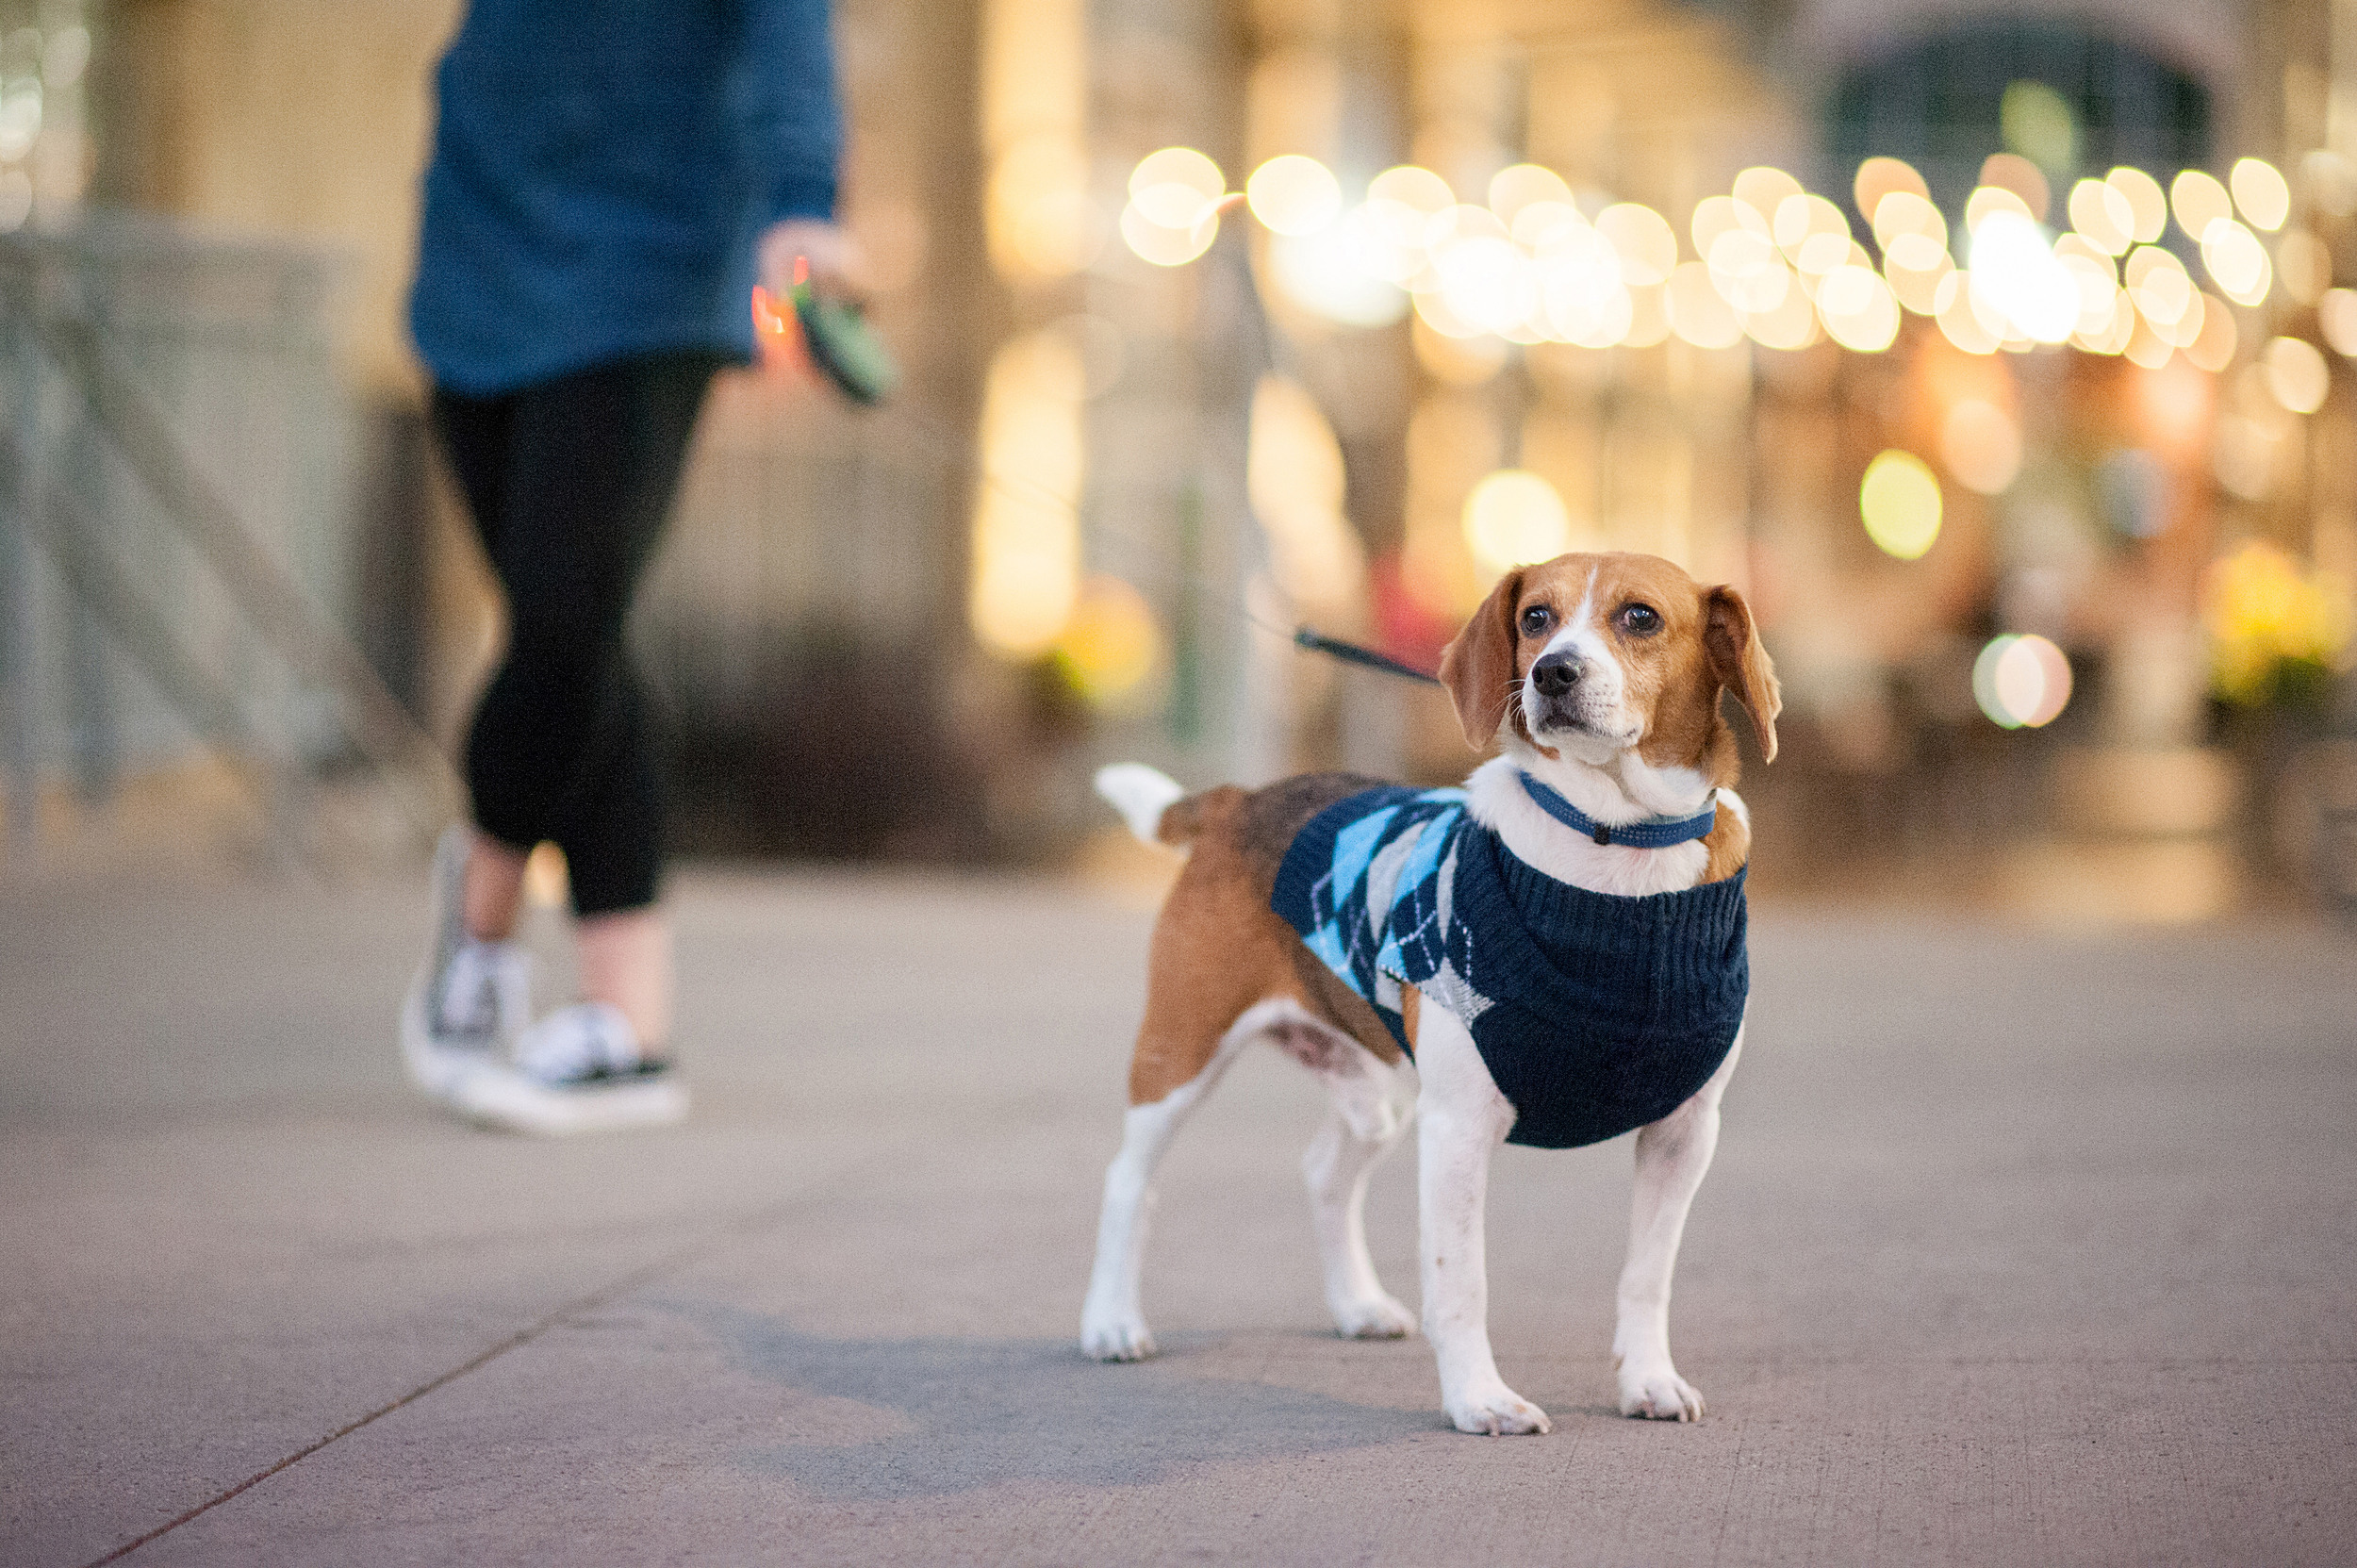 dexter jack-a-bee dog photography pittsburgh 031.jpg